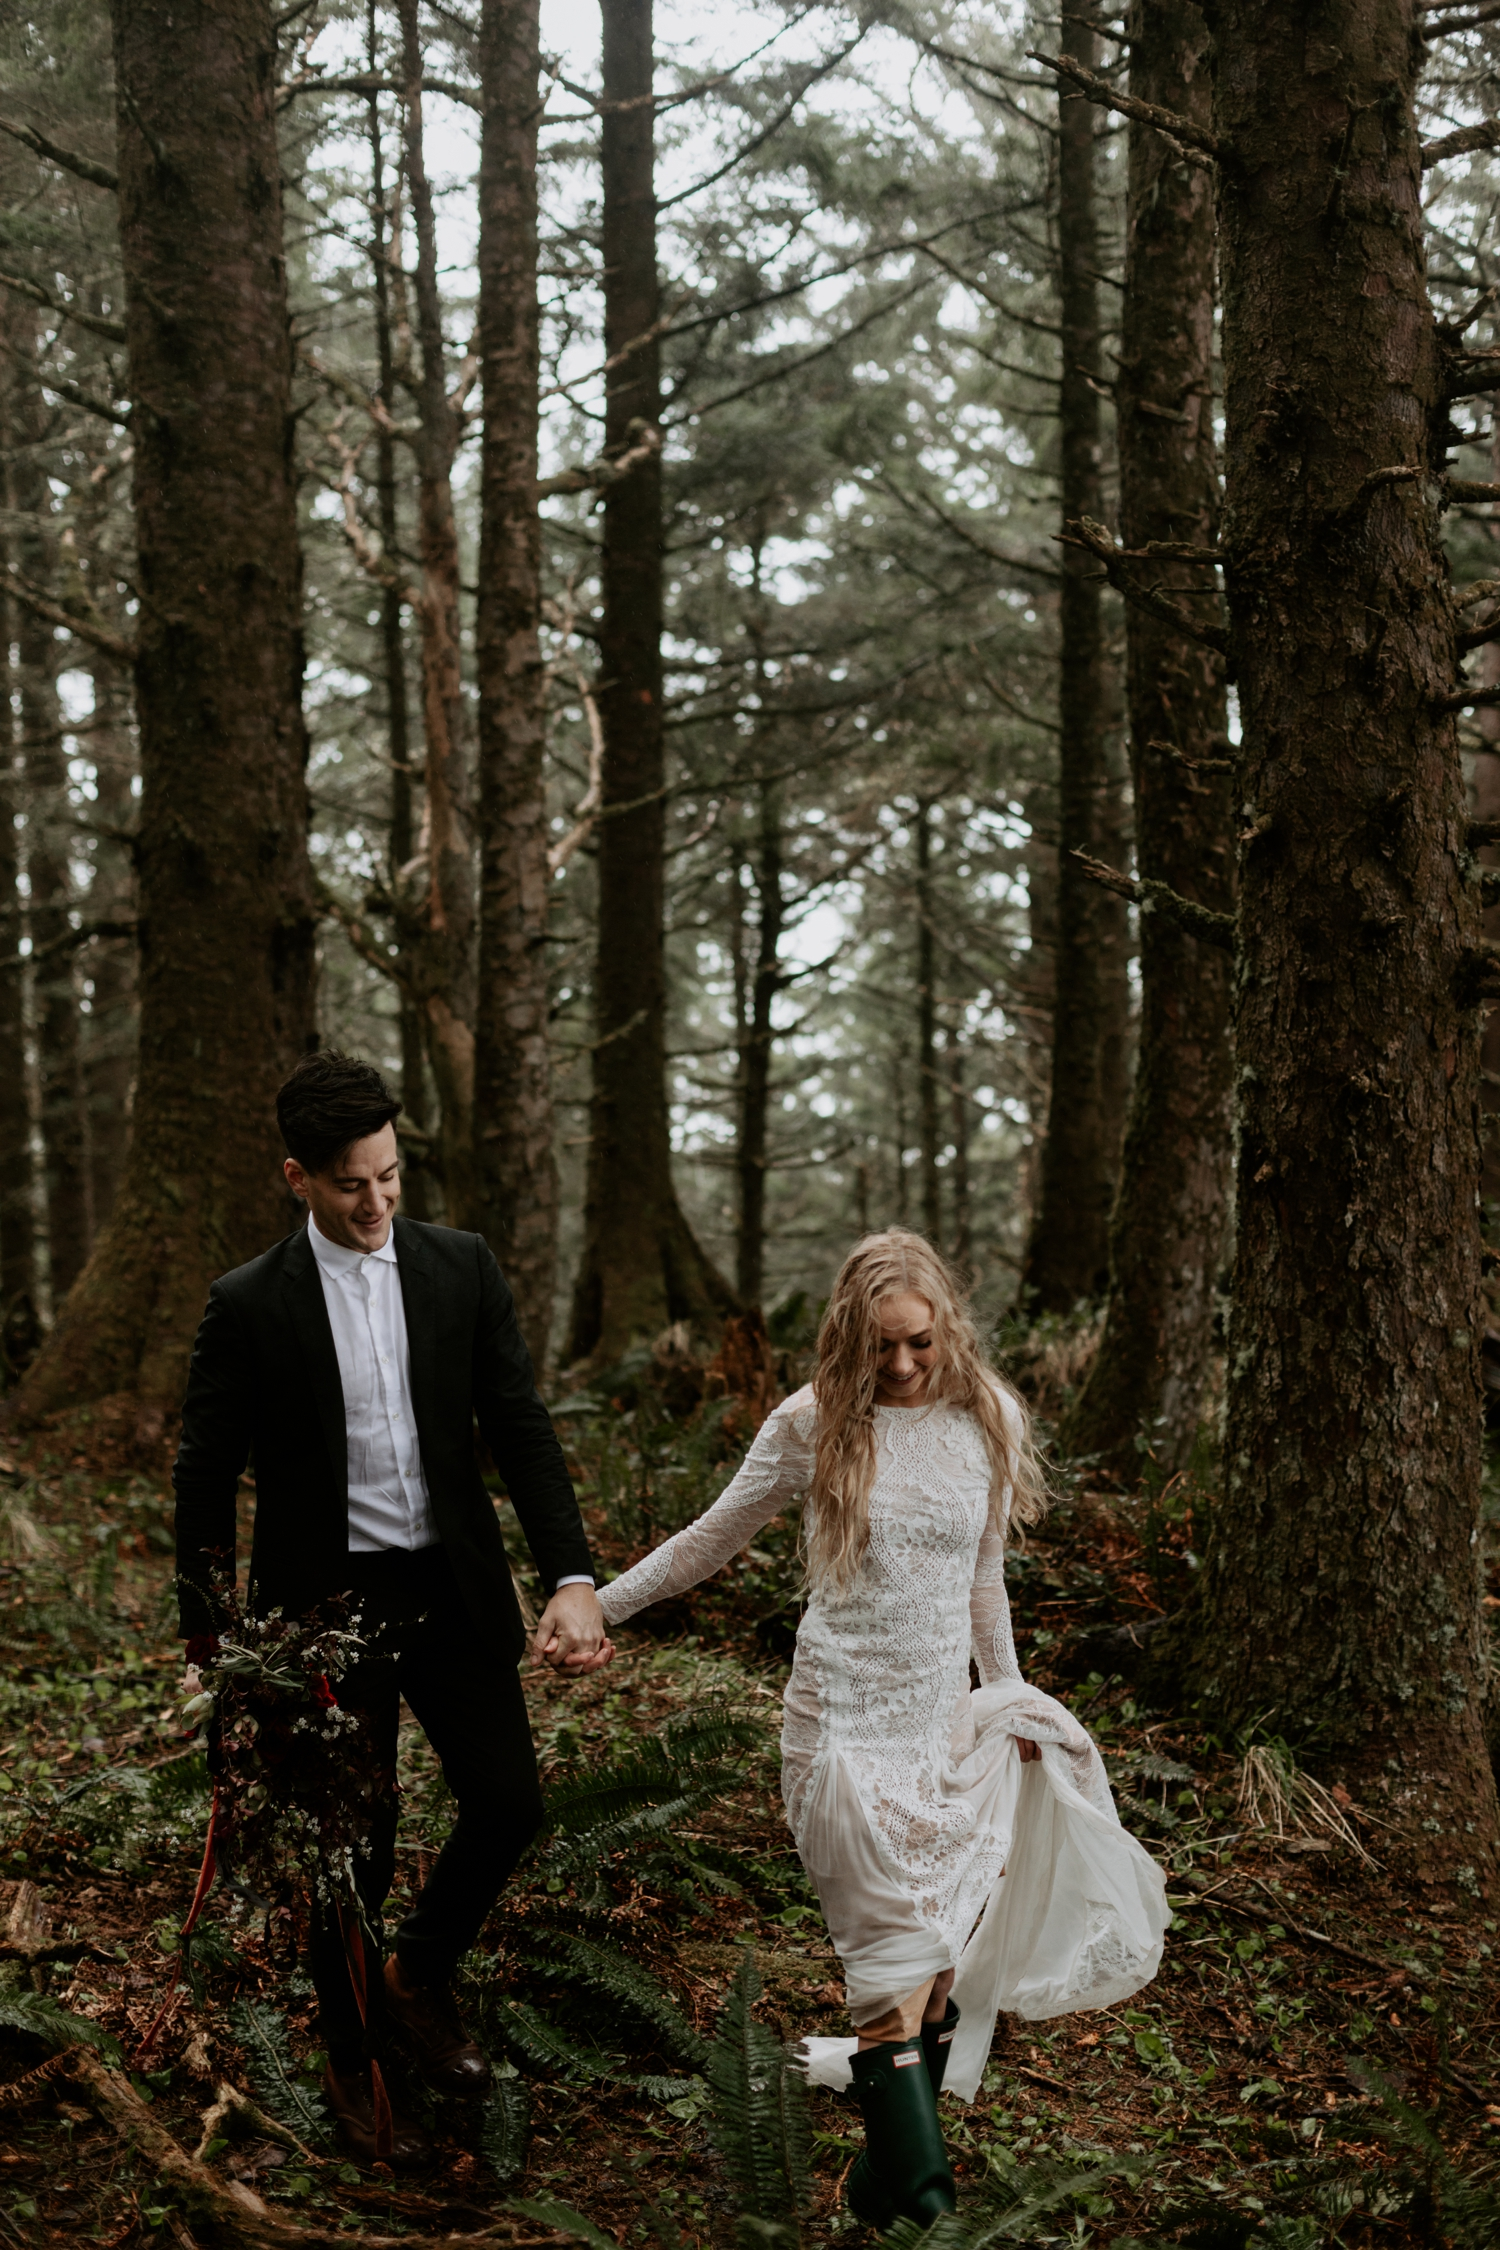 ecola-state-park-elopement-2018-05-02_0064.jpg